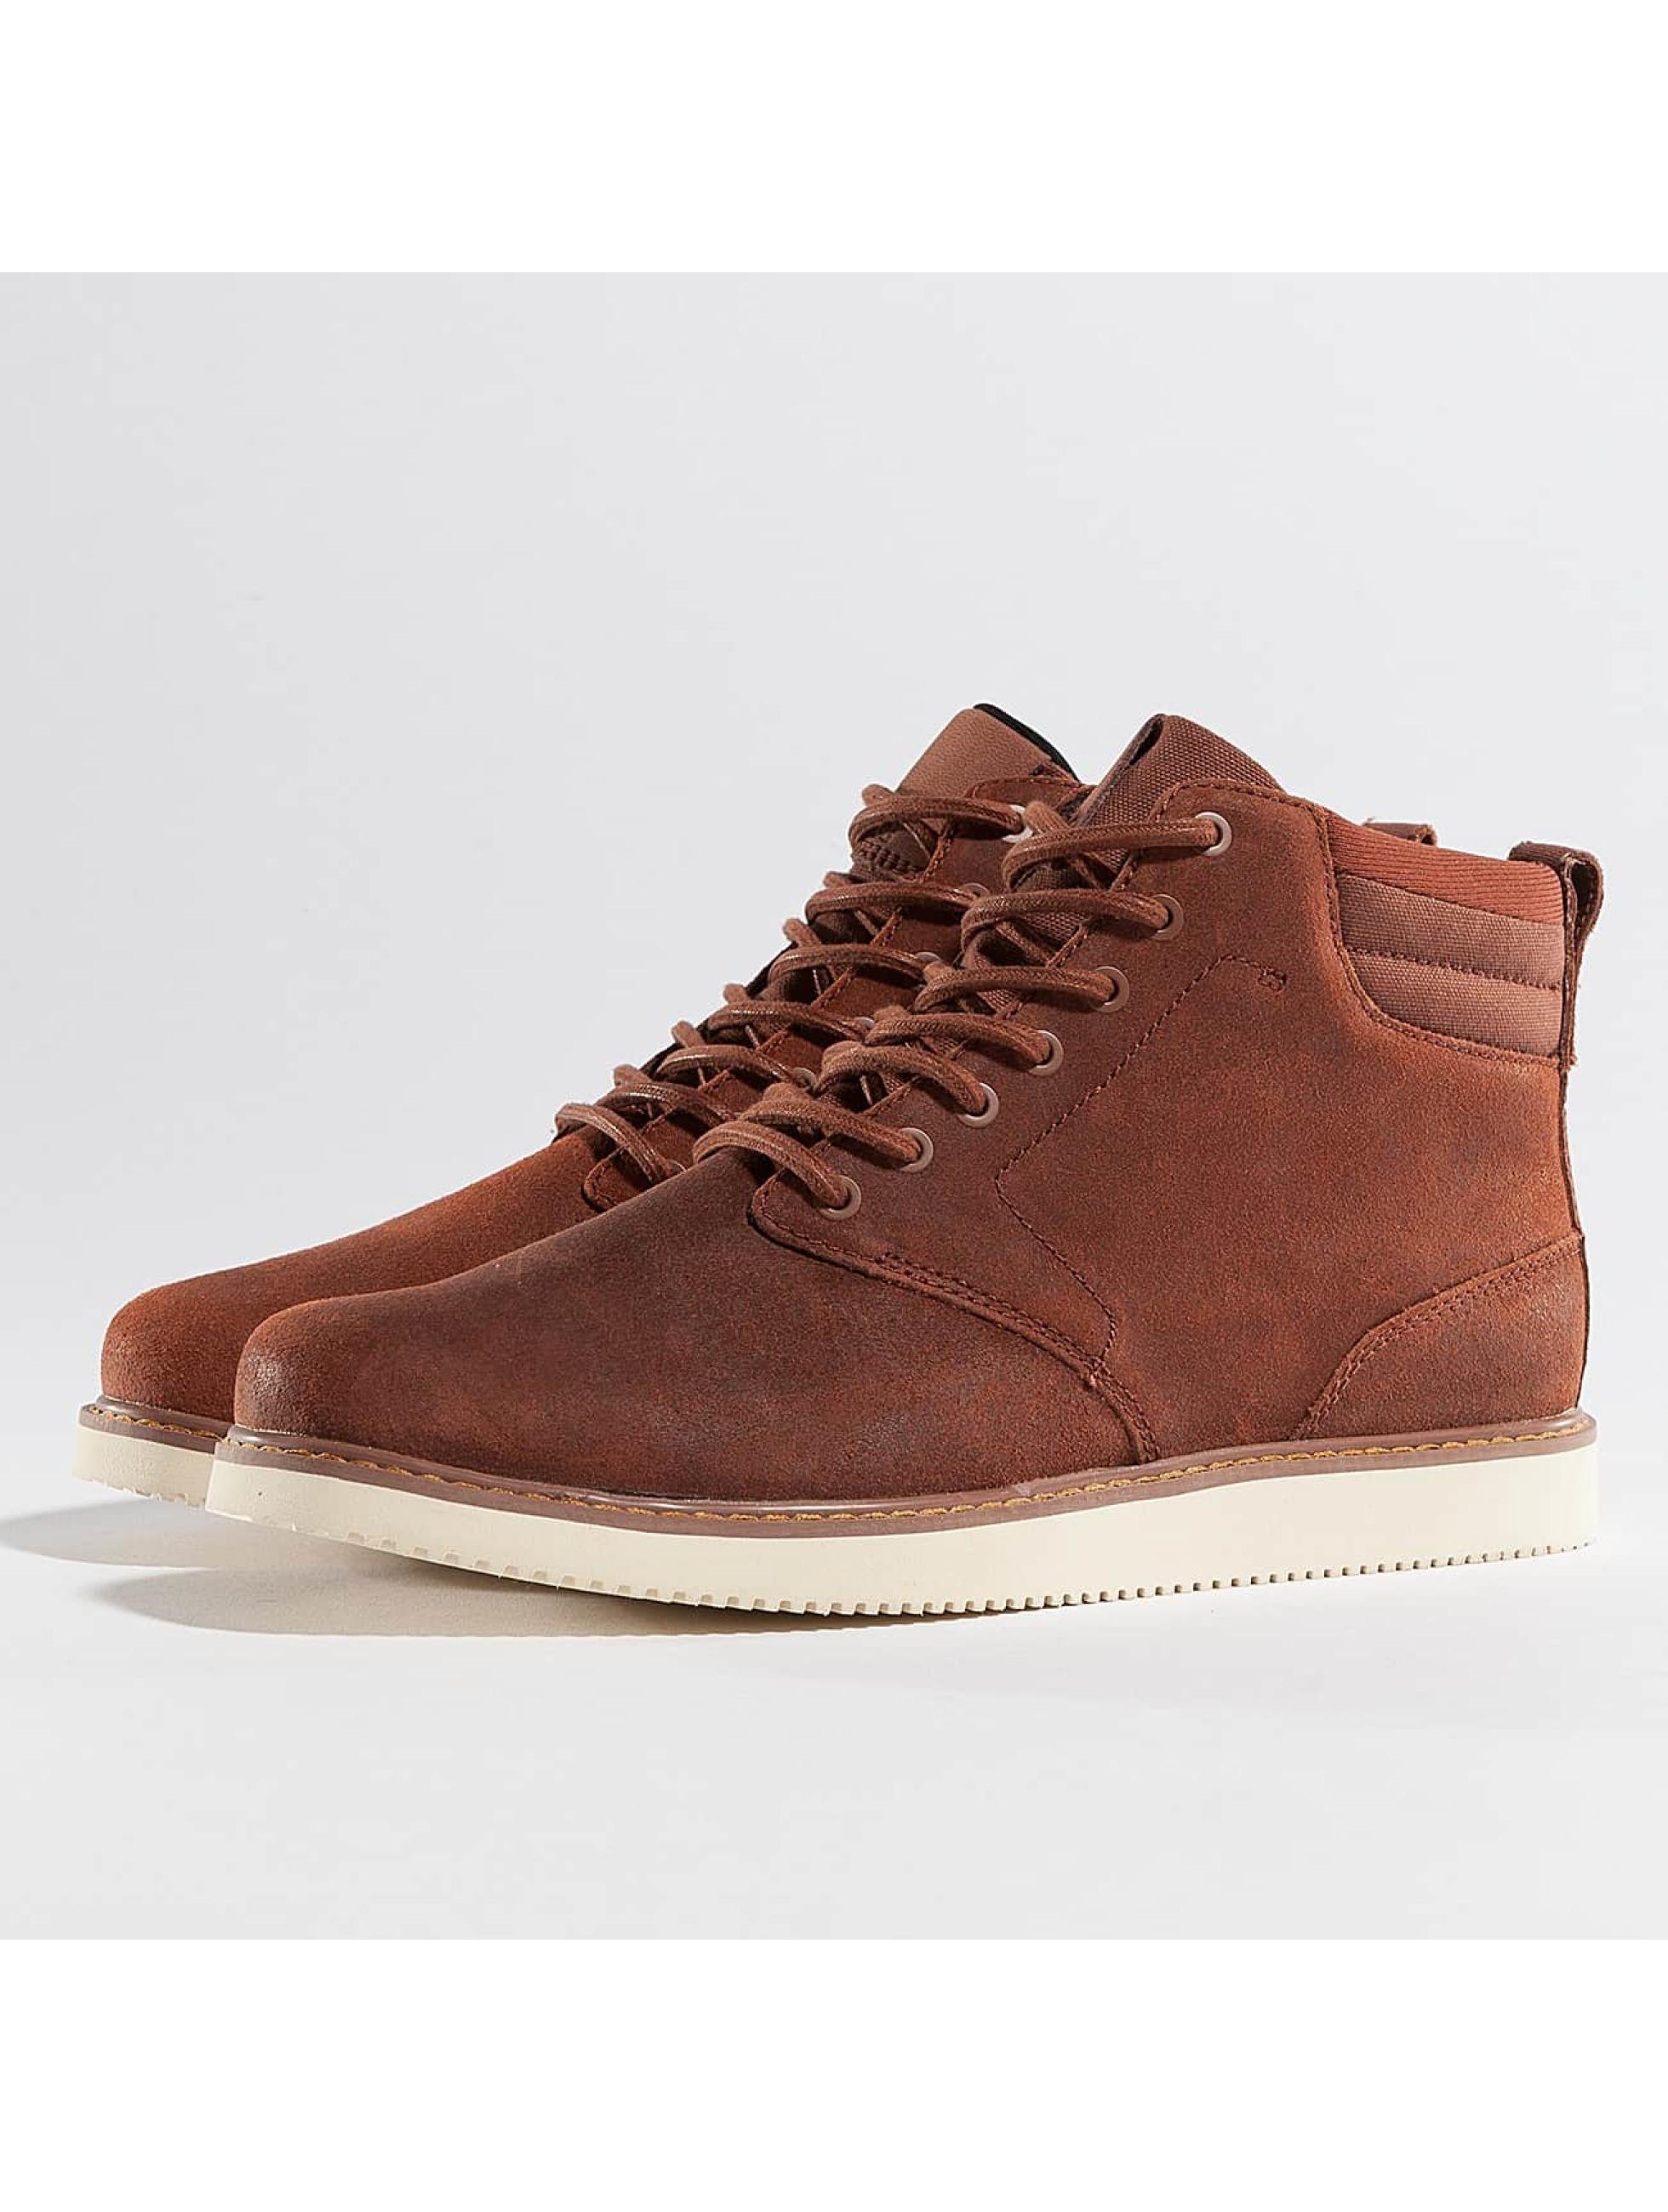 DC Mason brun Chaussures montantes homme